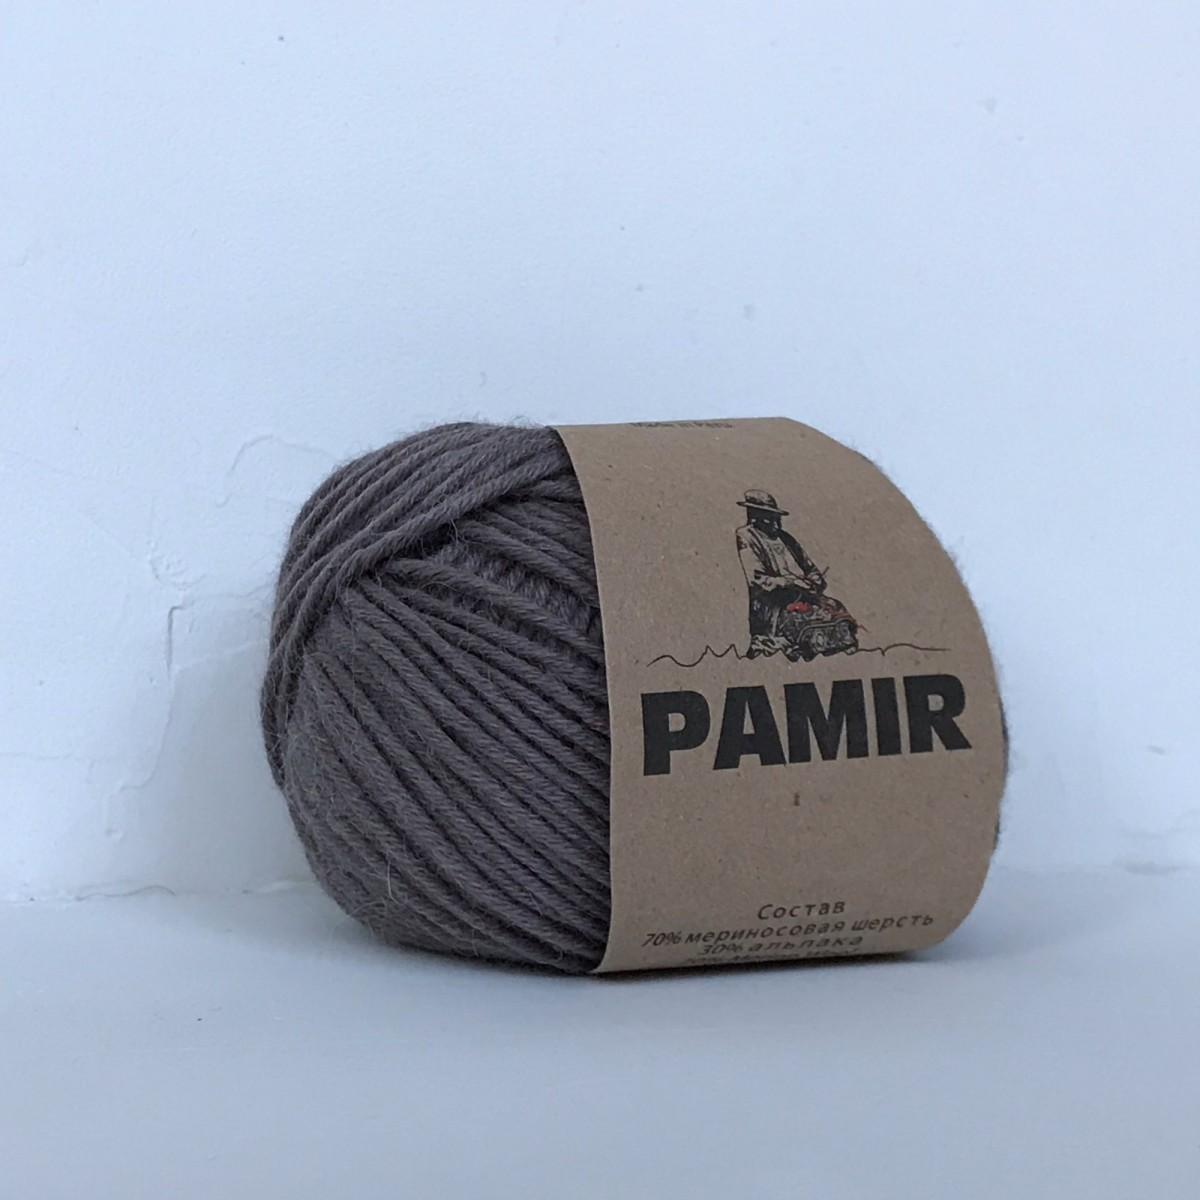 Пряжа Памир (Pamir)